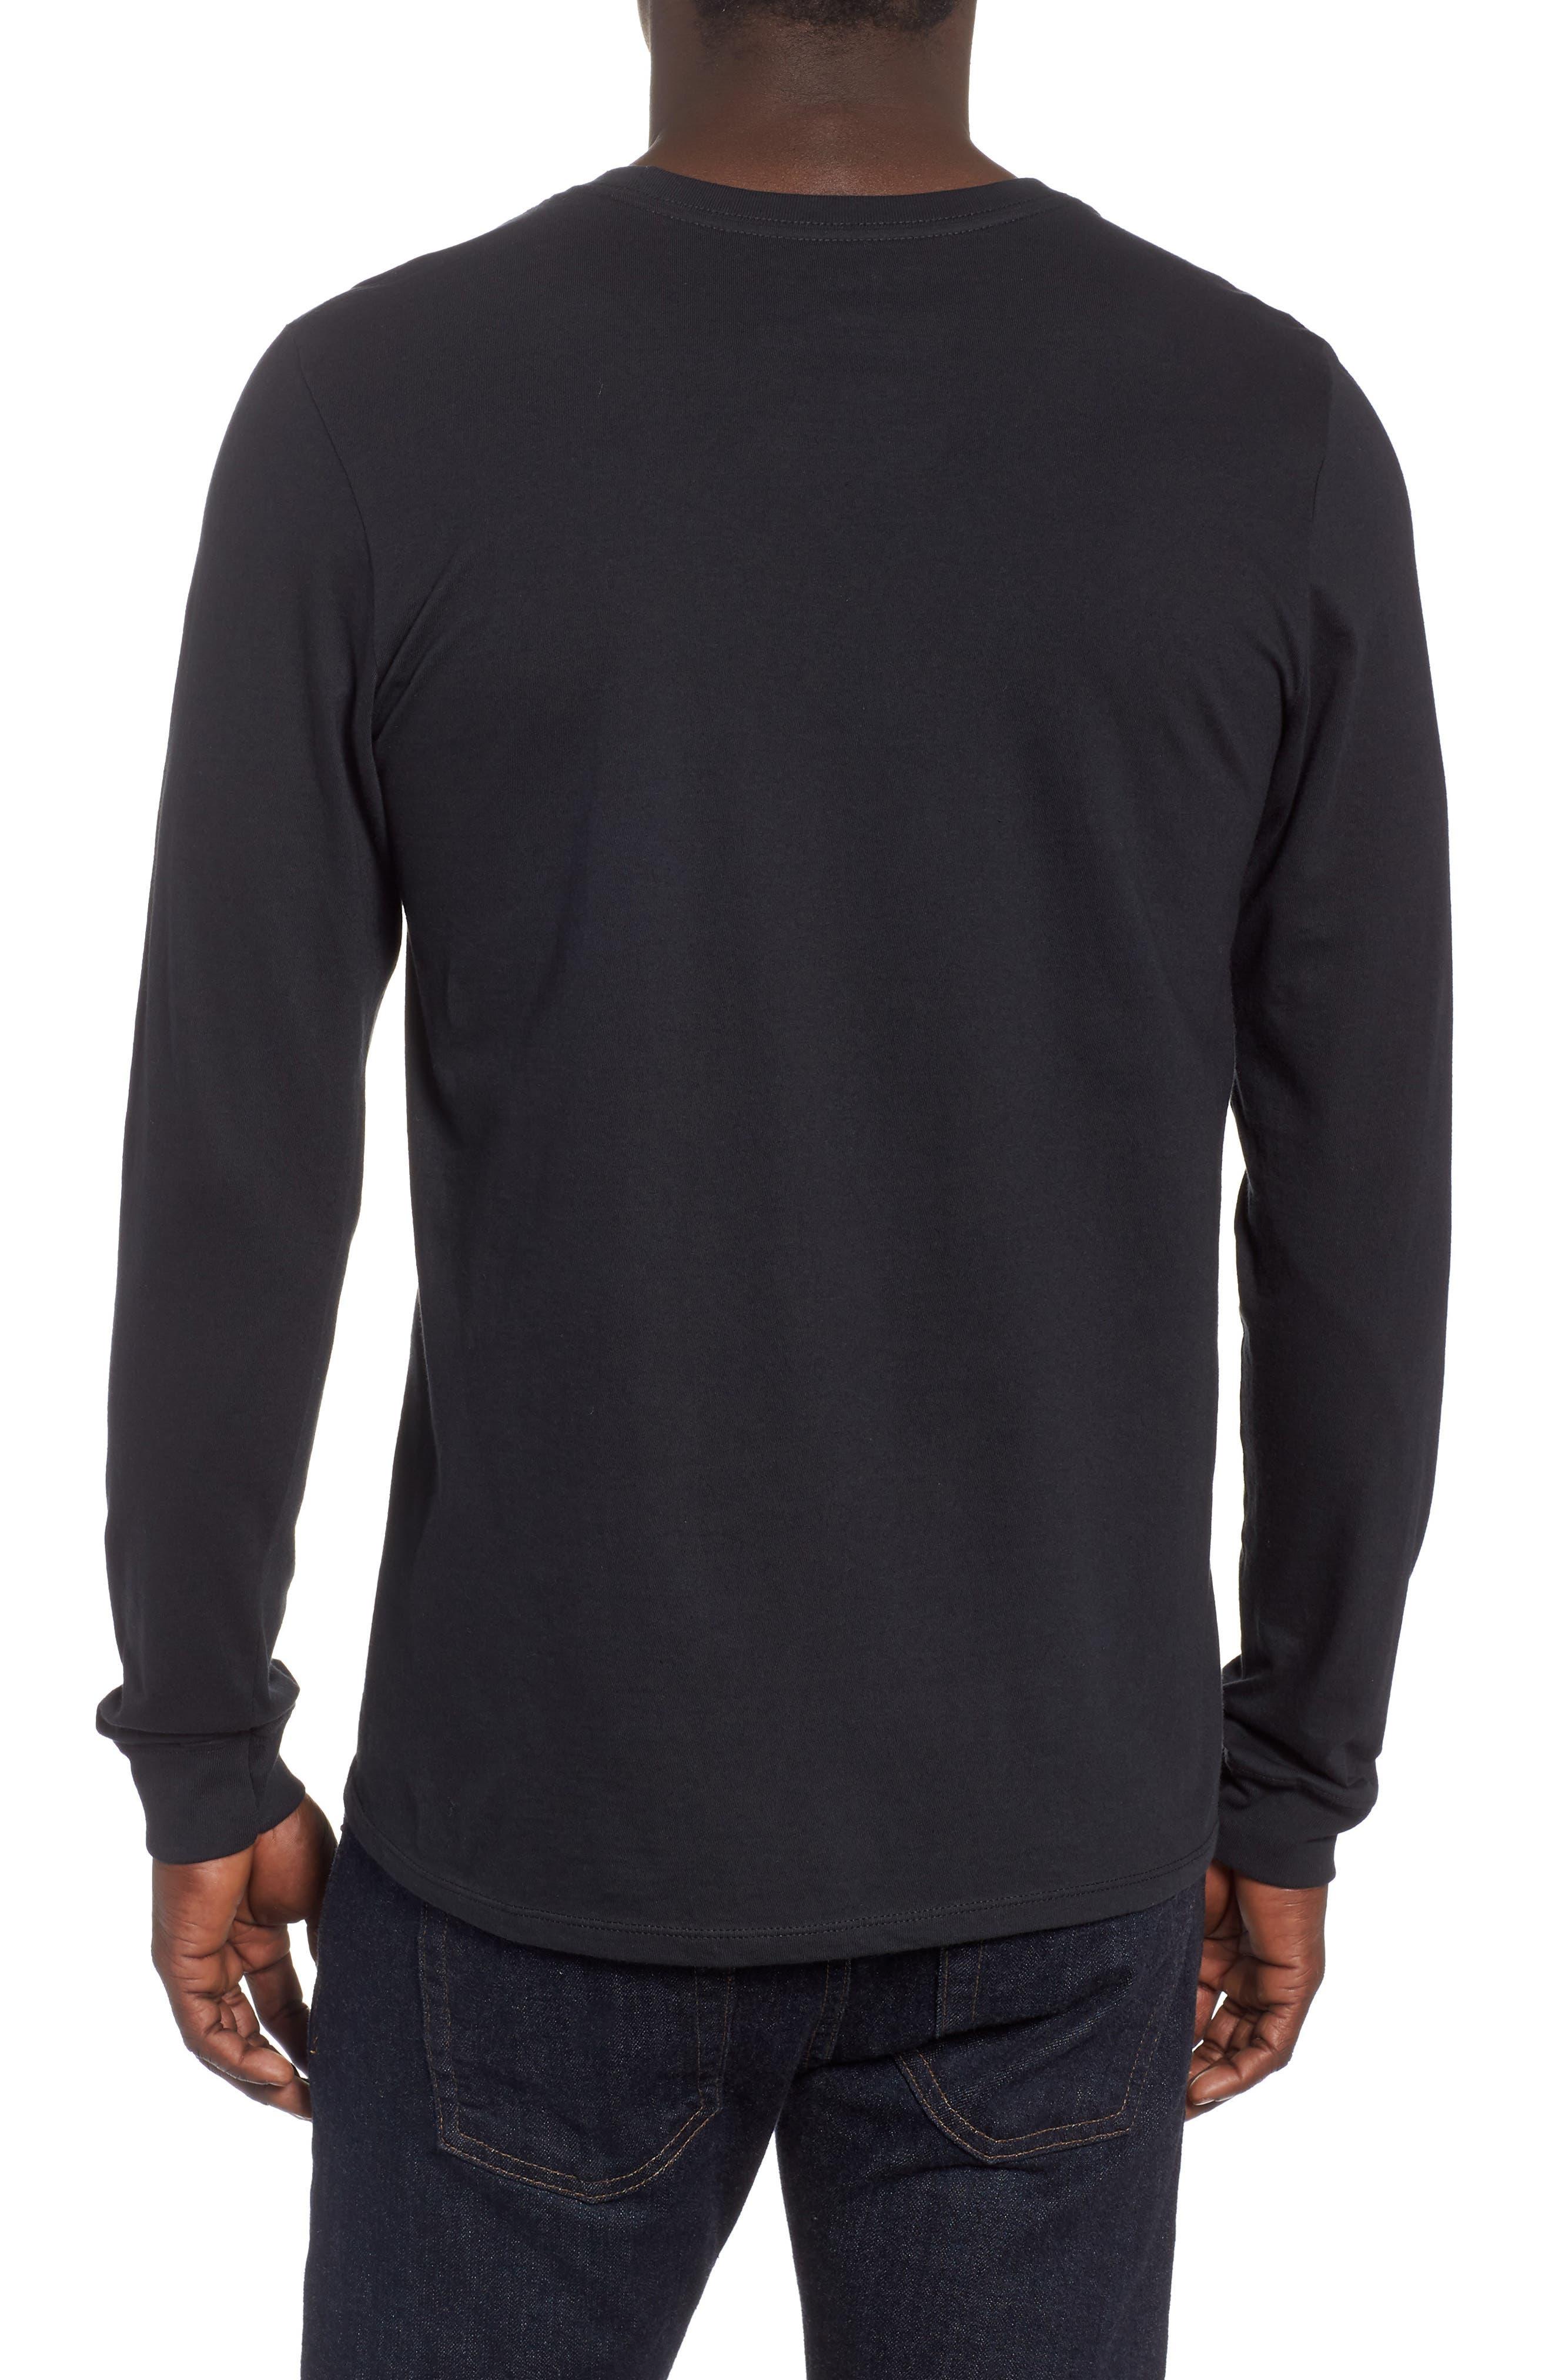 Tread Lightly Long Sleeve T-Shirt,                             Alternate thumbnail 2, color,                             BLACK